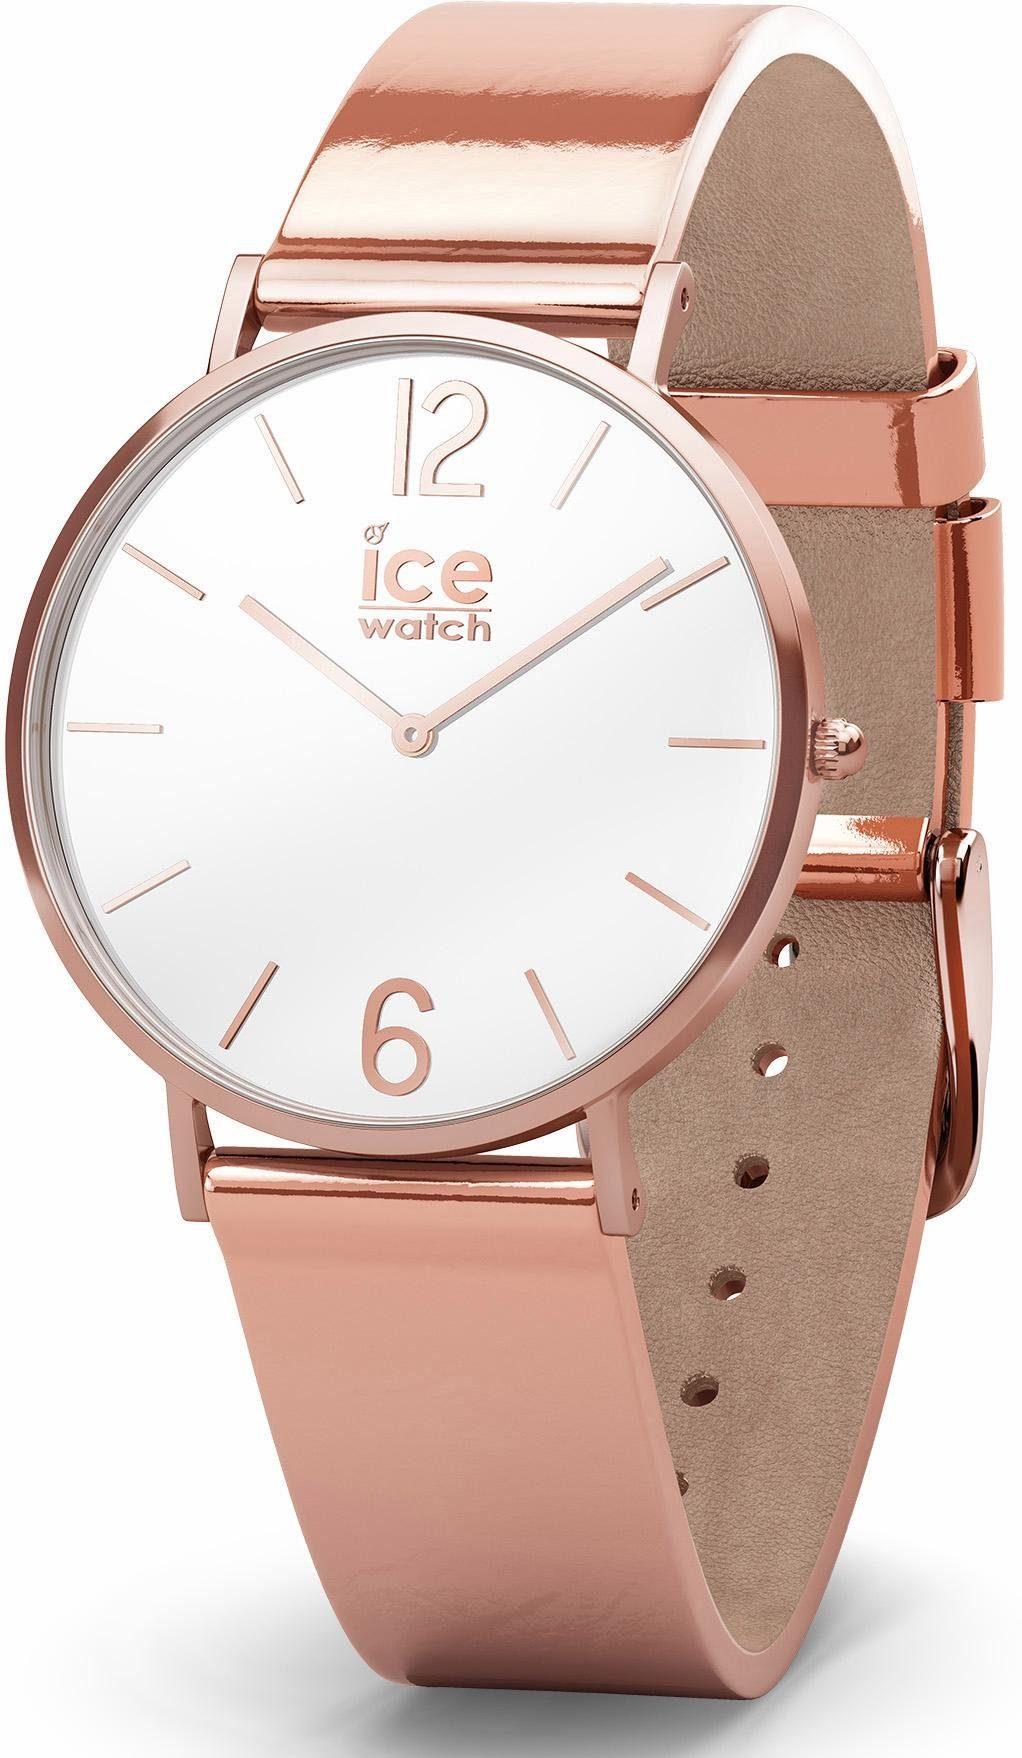 ice-watch Quarzuhr »CITY sparkling - Metal Rosegold - Small - 2H, 015091«